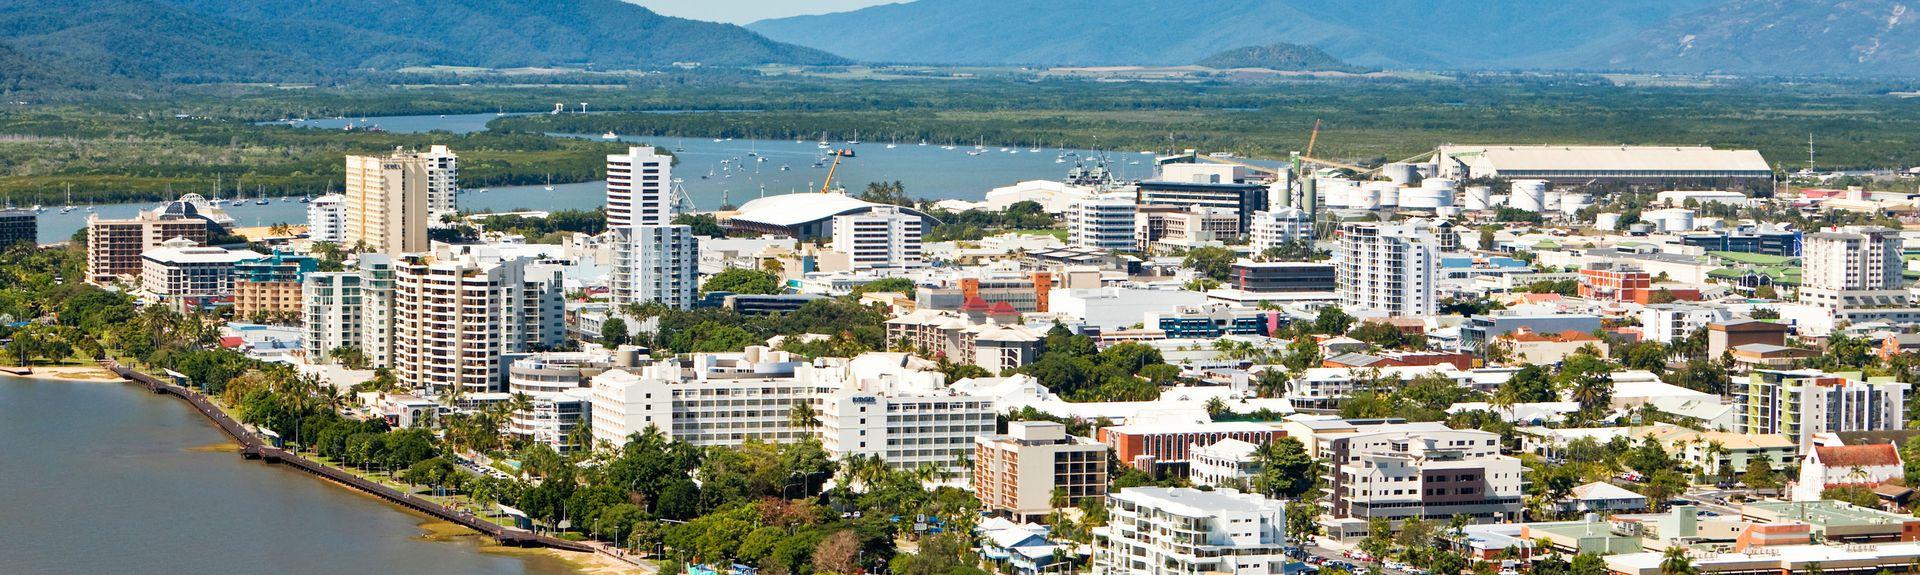 Cairns, Cairns, Queensland, Australia